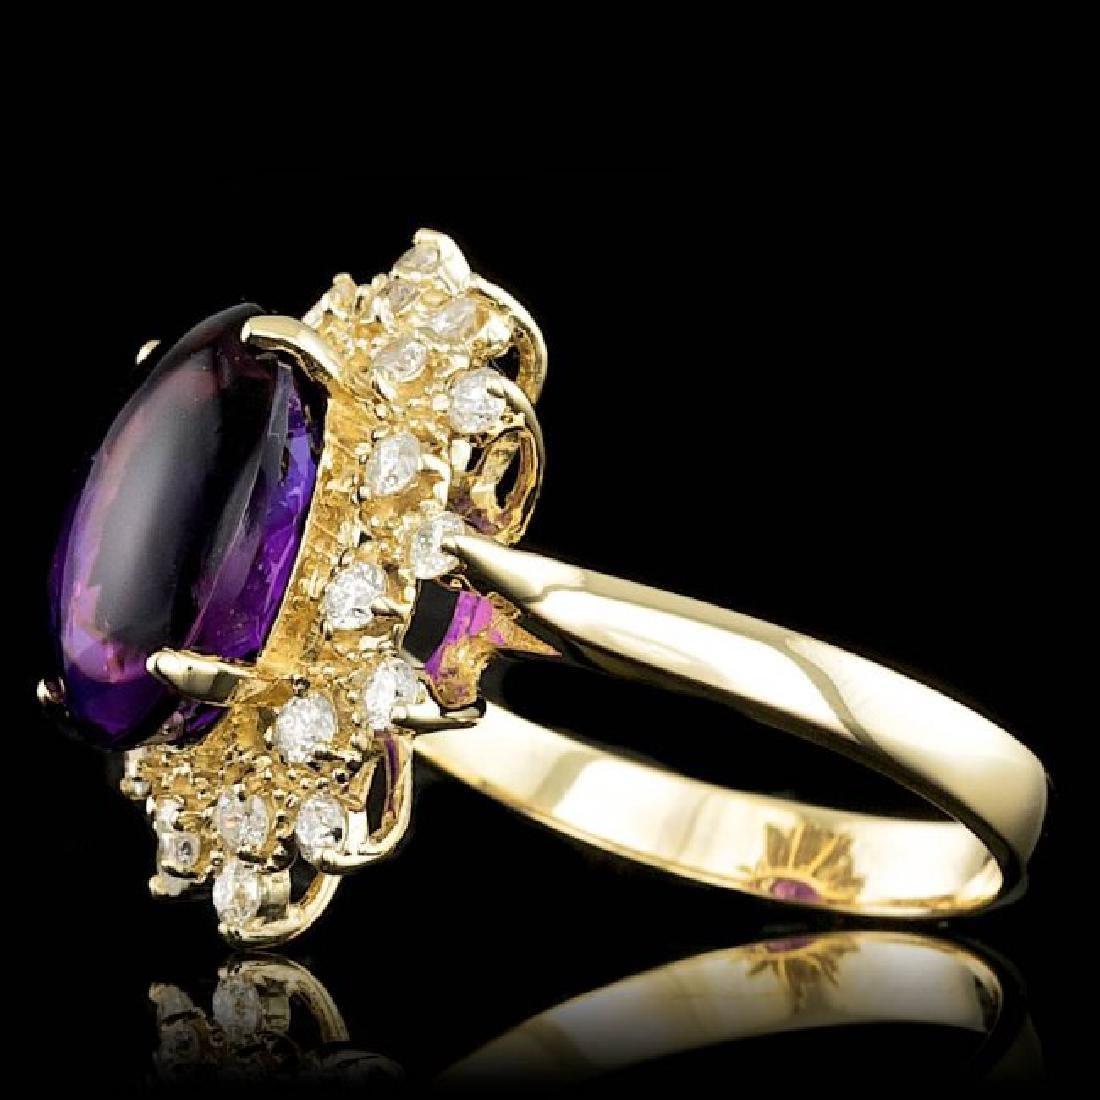 14k Gold 5.00ct Amethyst 0.70ct Diamond Ring - 2